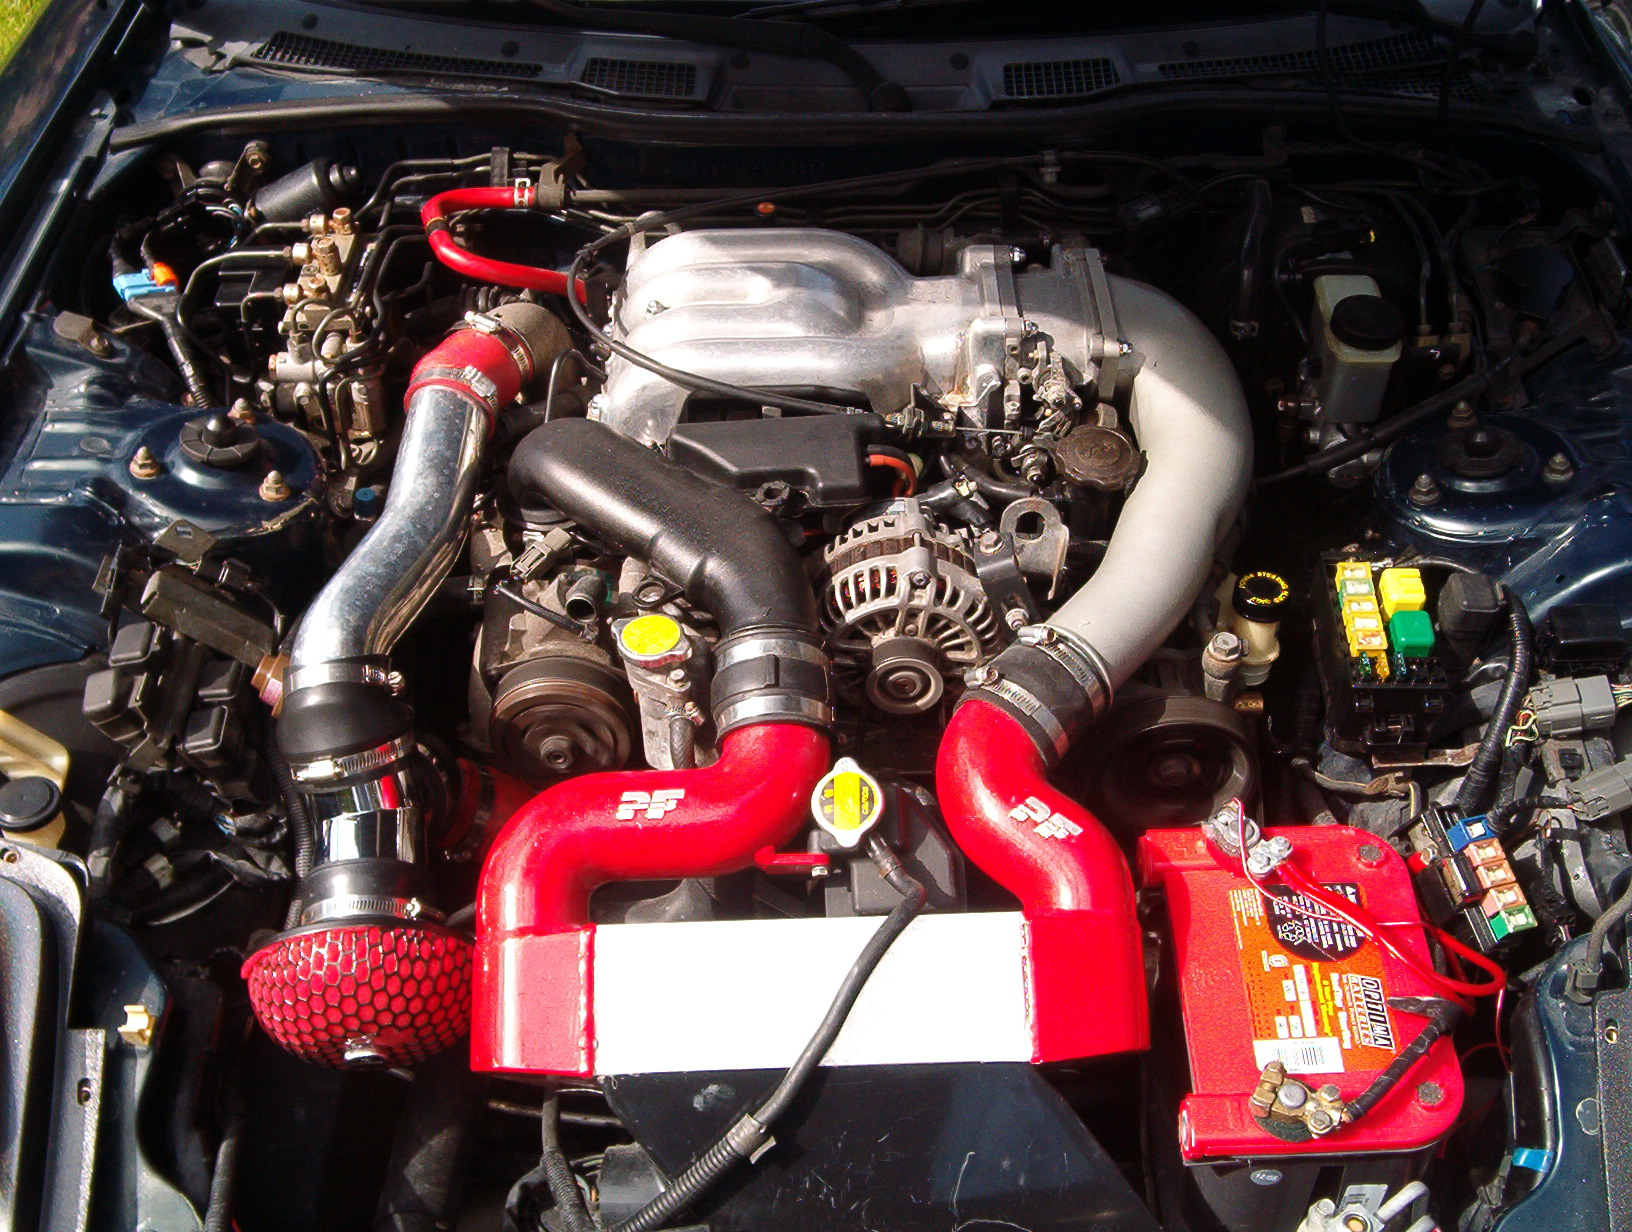 File:Mazda RX7 engine.jpg - Wikimedia Commons